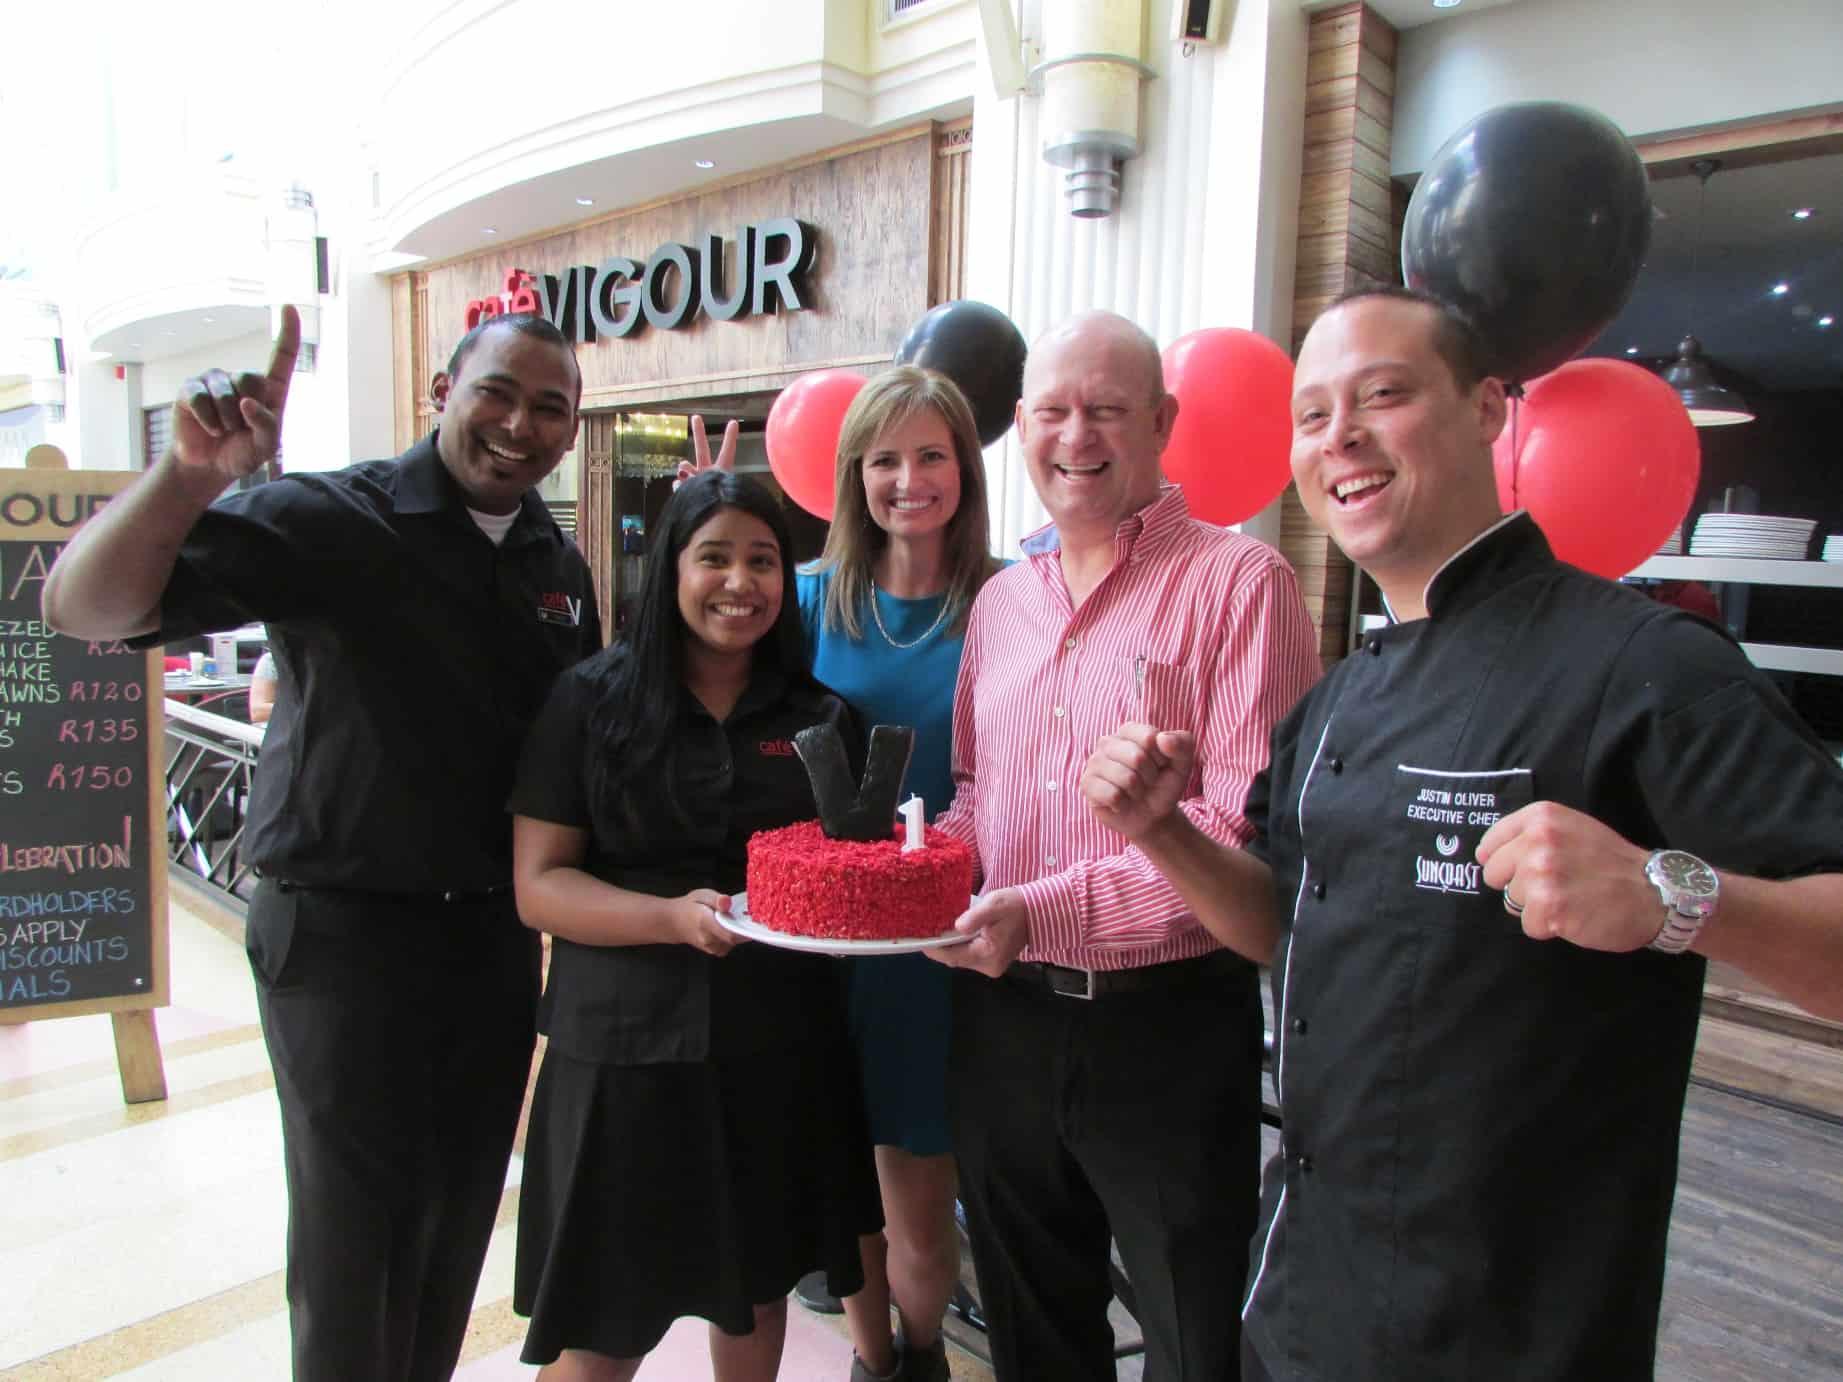 Cafe Vigour celebrates the first birthday at Suncoast (team)